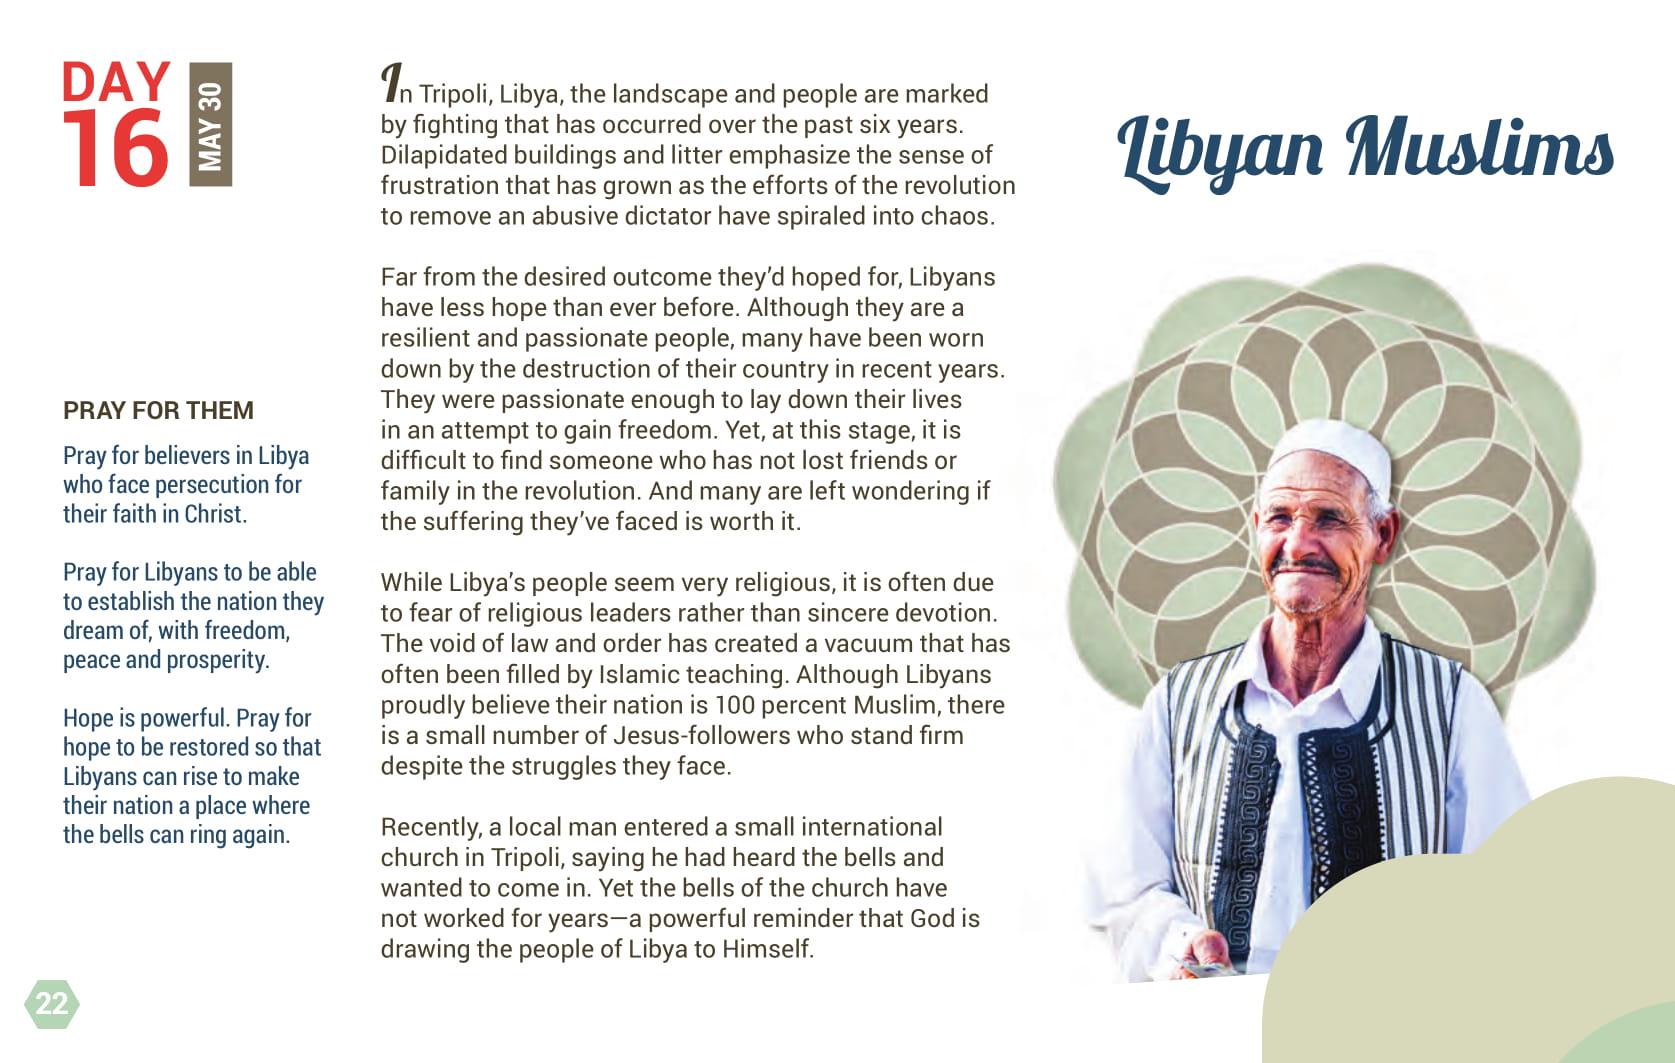 Day 16 - Libyan Muslims